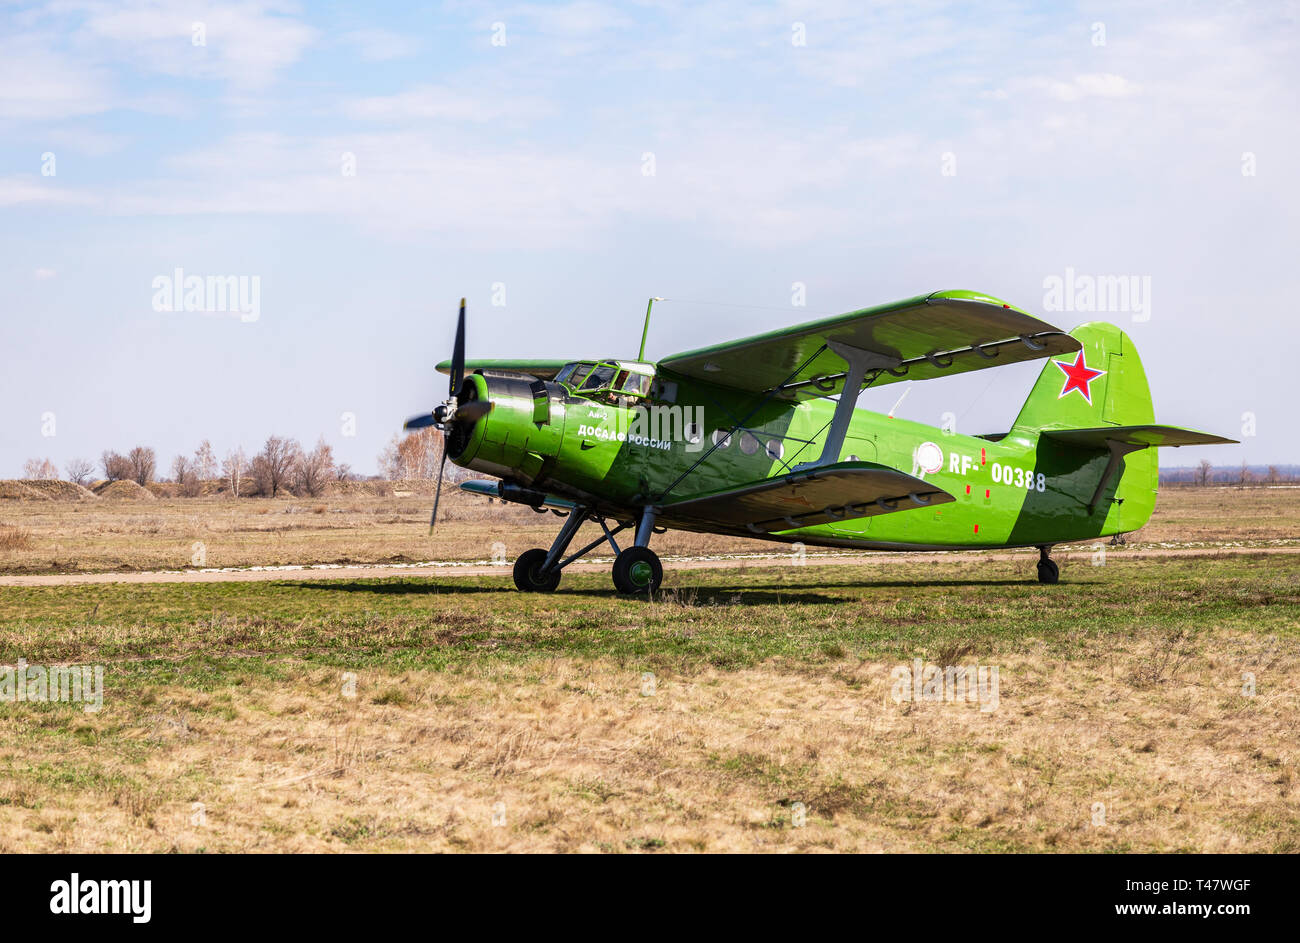 Samara, Russia - April 13, 2019: The Antonov An-2 a Soviet mass-produced single-engine biplane at an field aerodrome in summertime - Stock Image